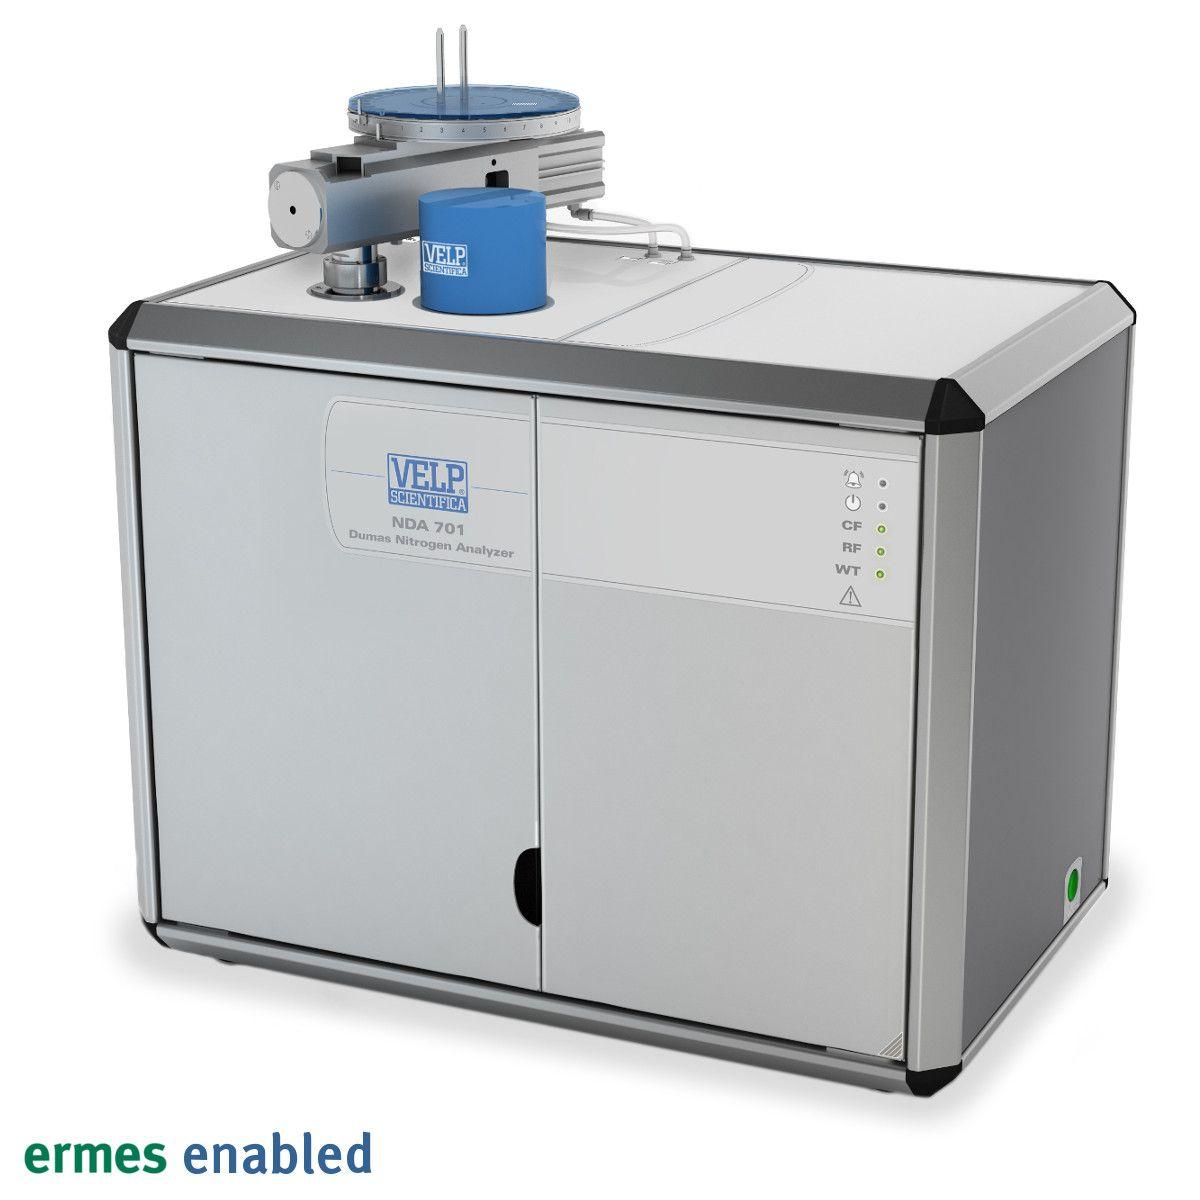 VELP Scientifica - NDA 701 Dumas Nitrogen Analyzer